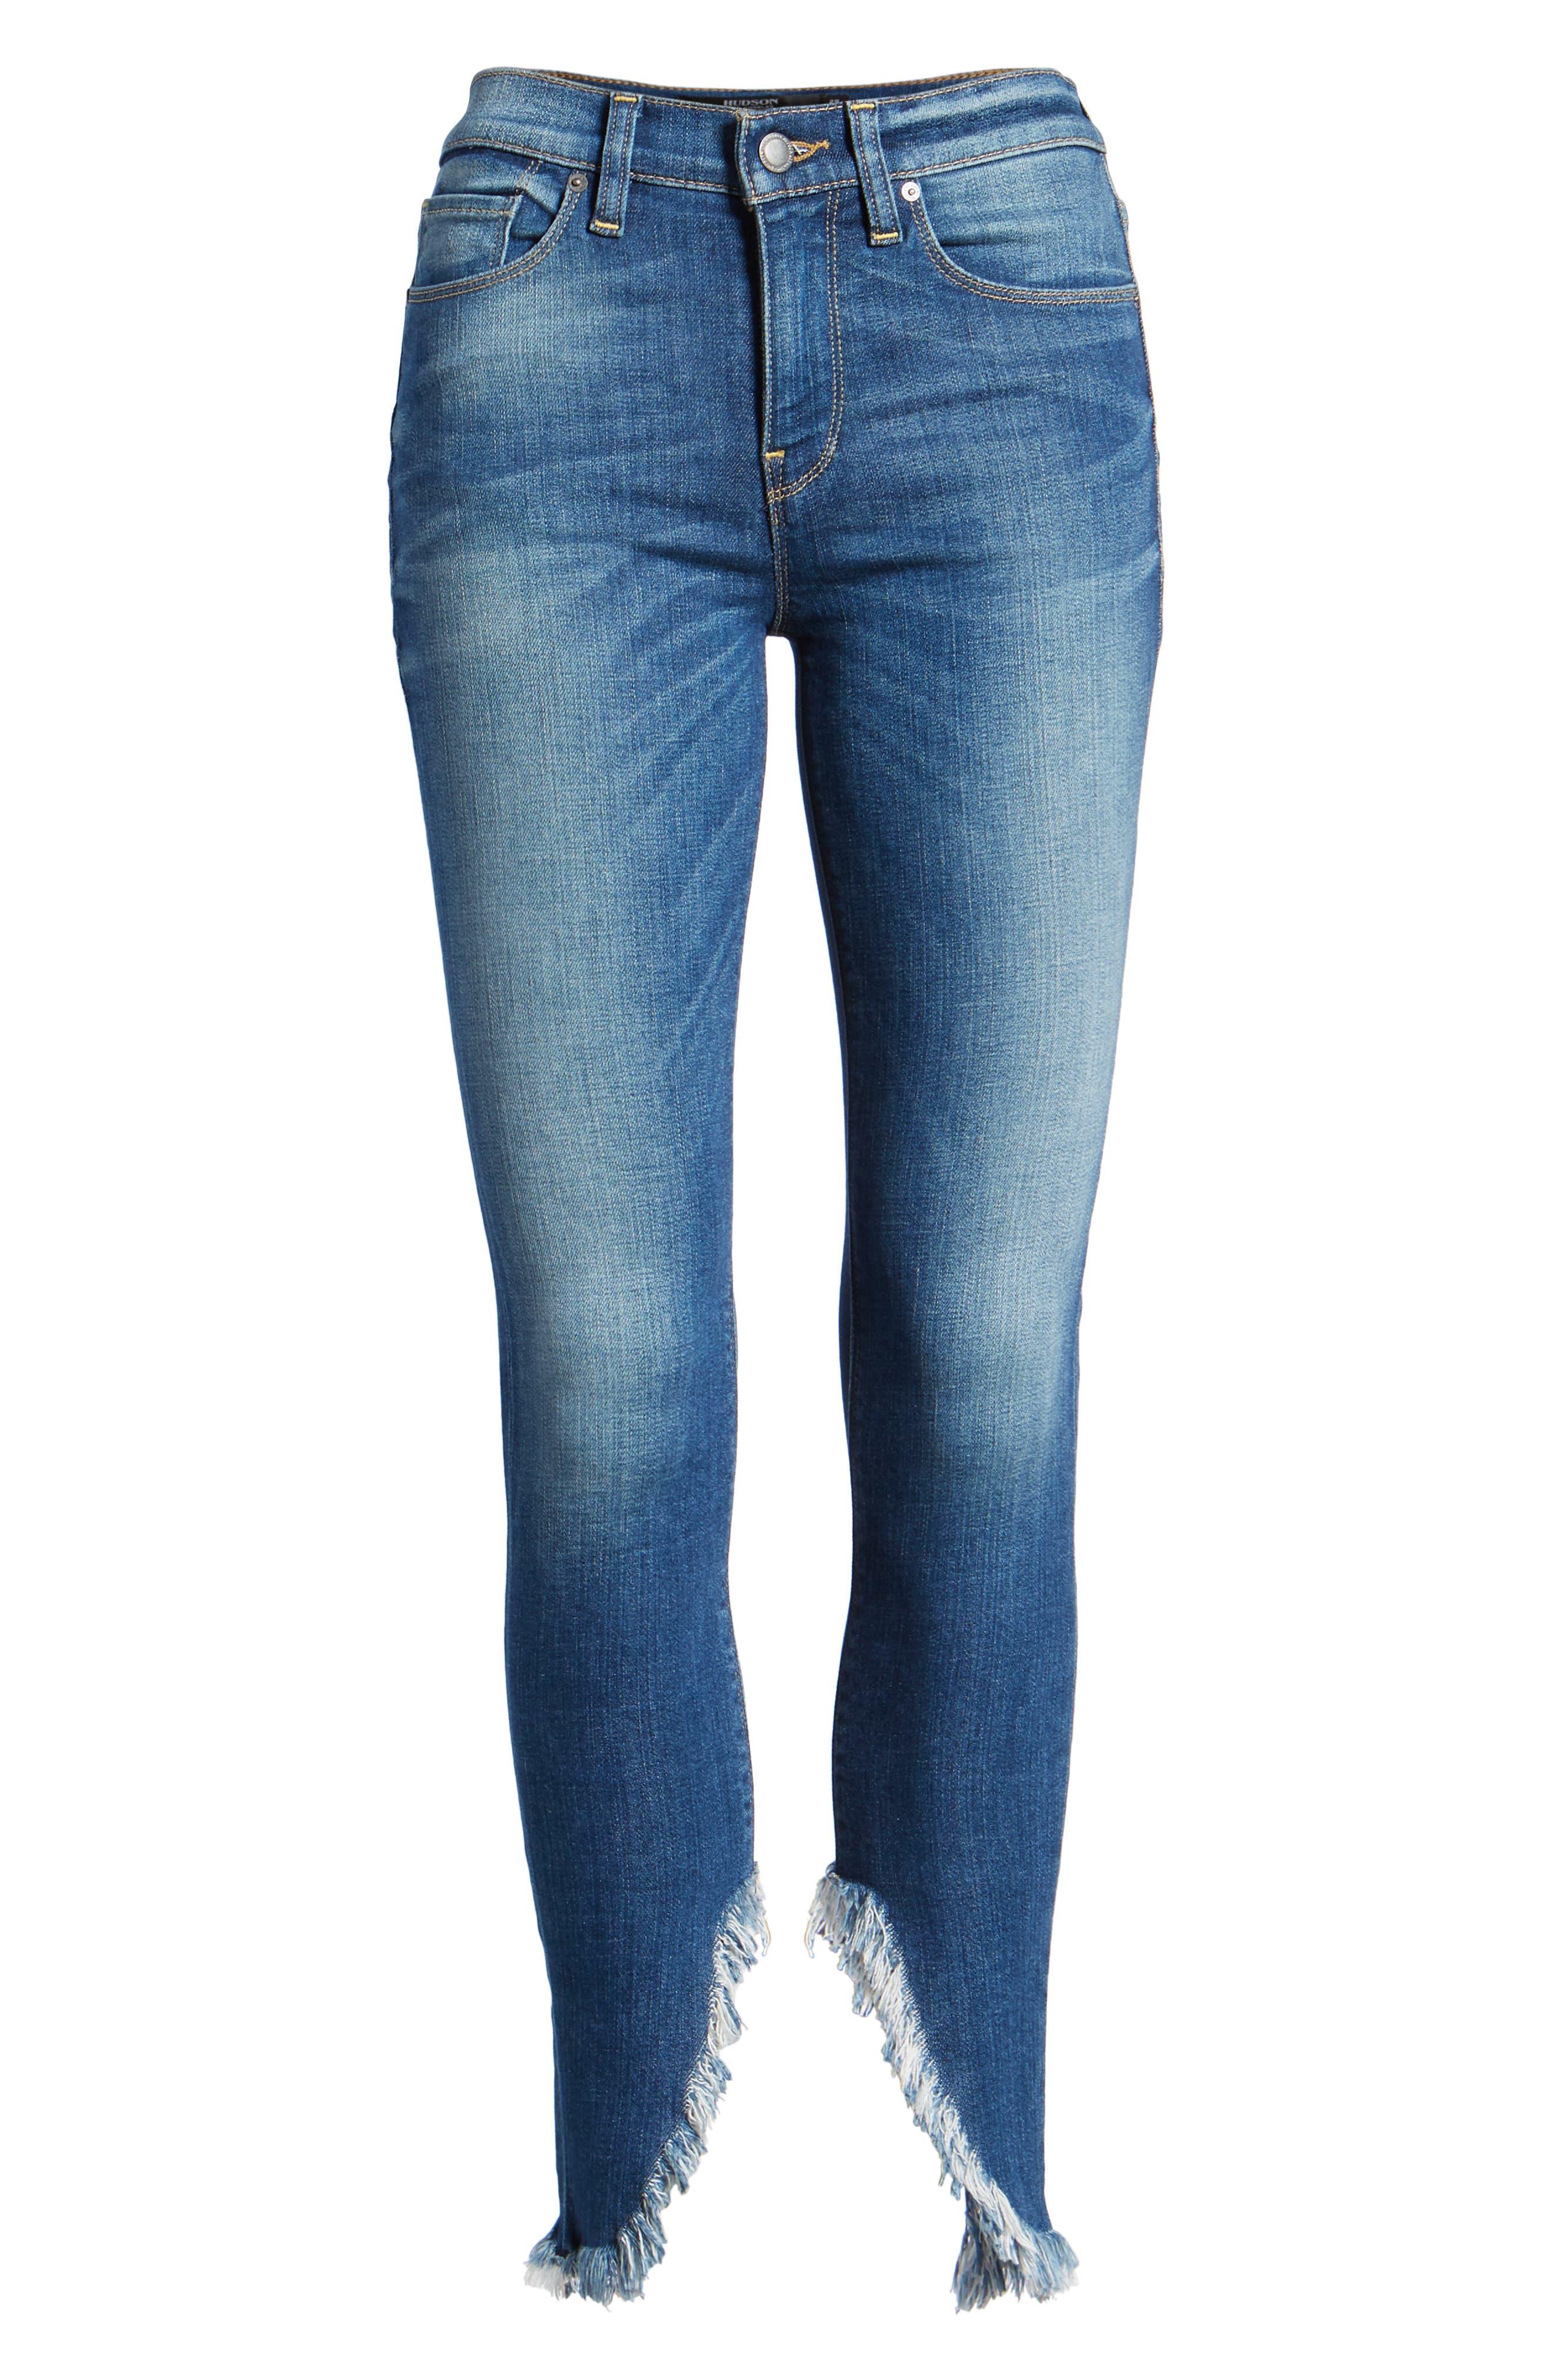 Nico Ankle Super Skinny Jeans,                             Alternate thumbnail 7, color,                             BLUE MONDAY